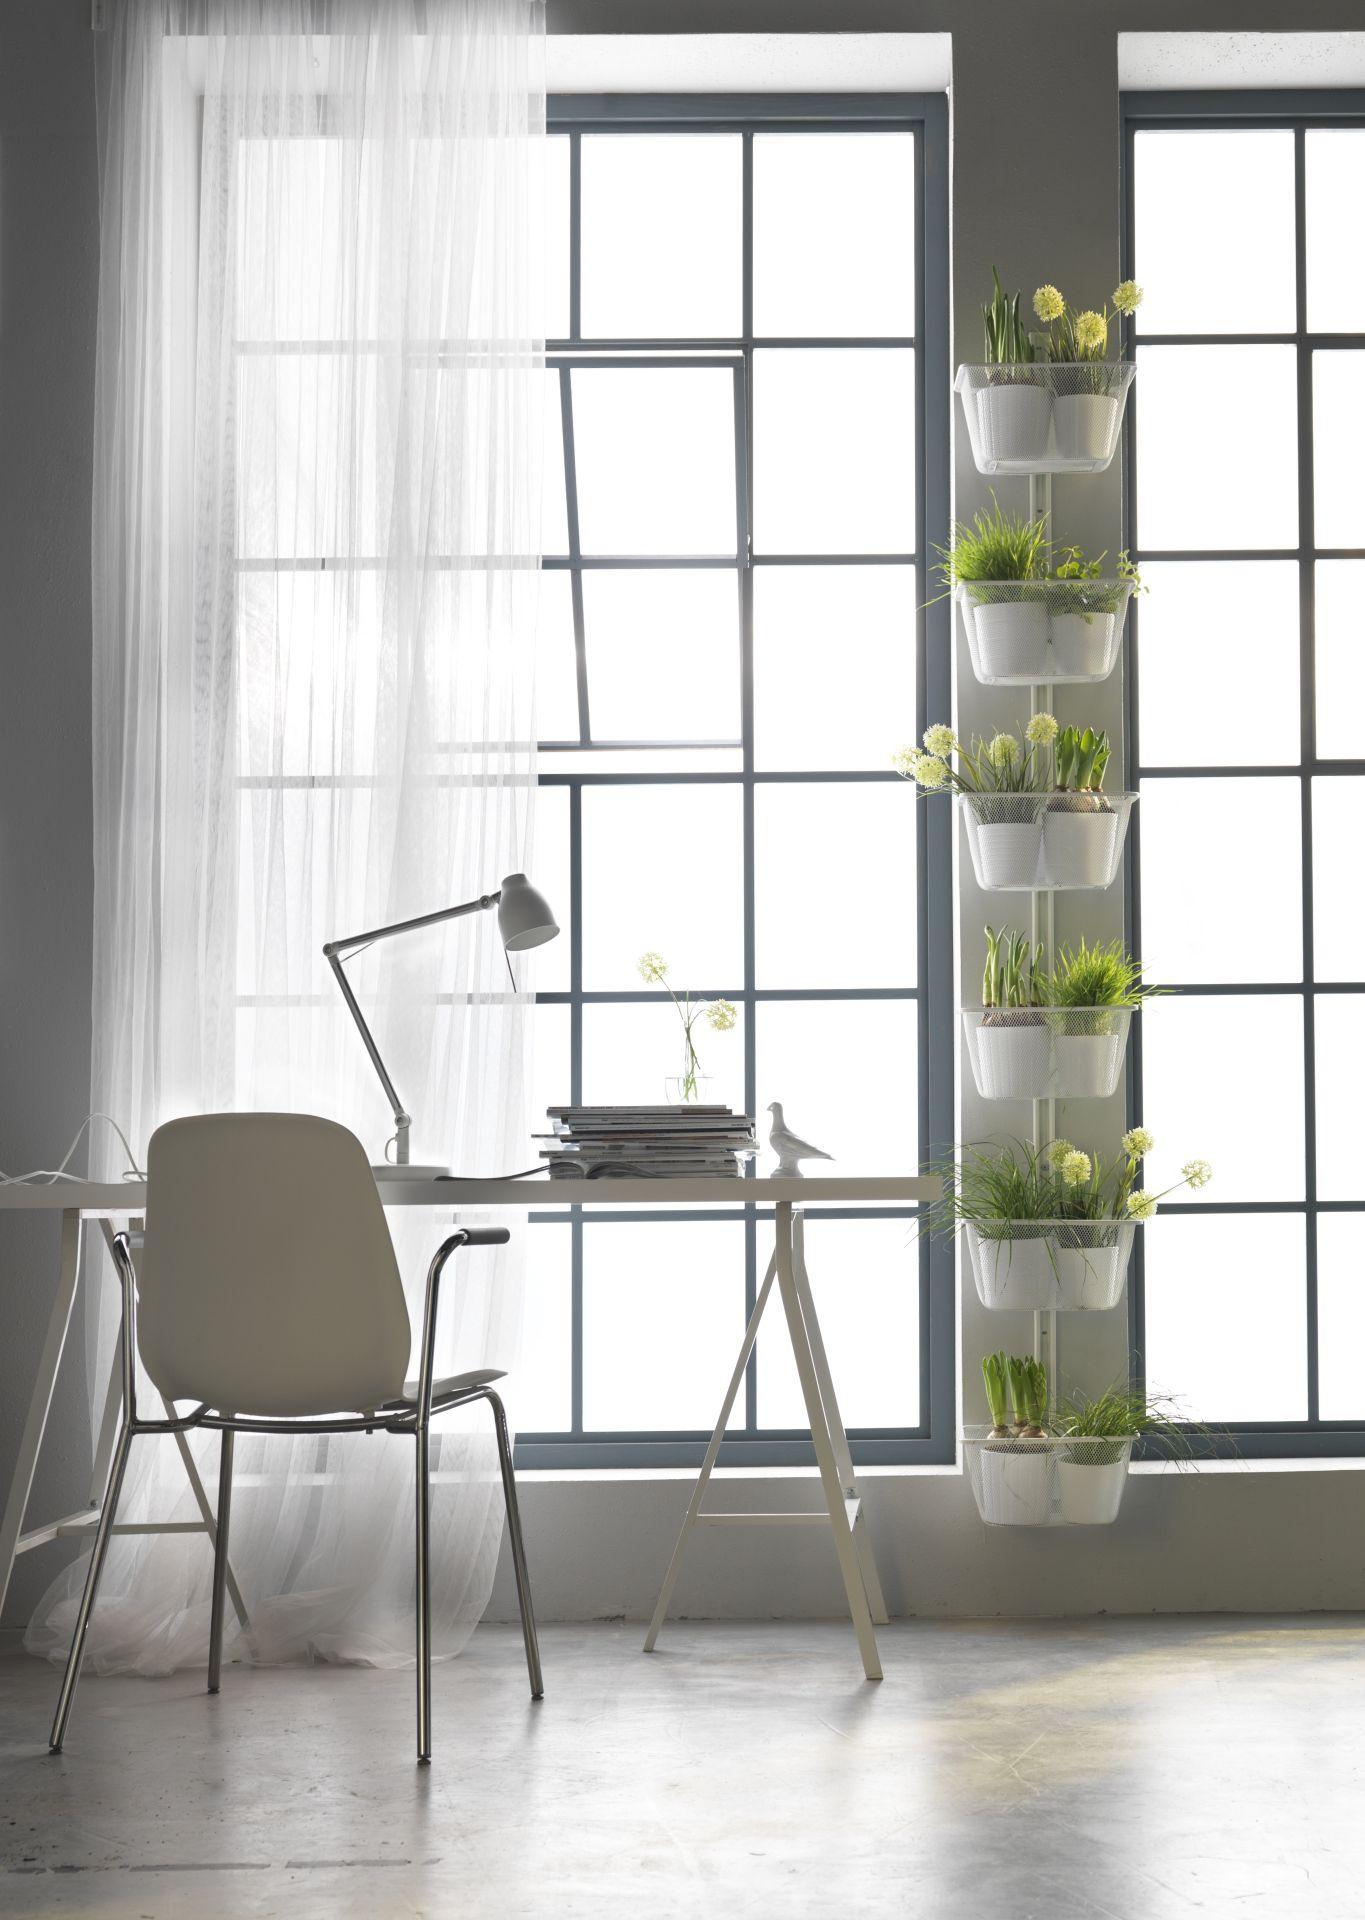 13++ Ikea jardiniere d interieur ideas in 2021